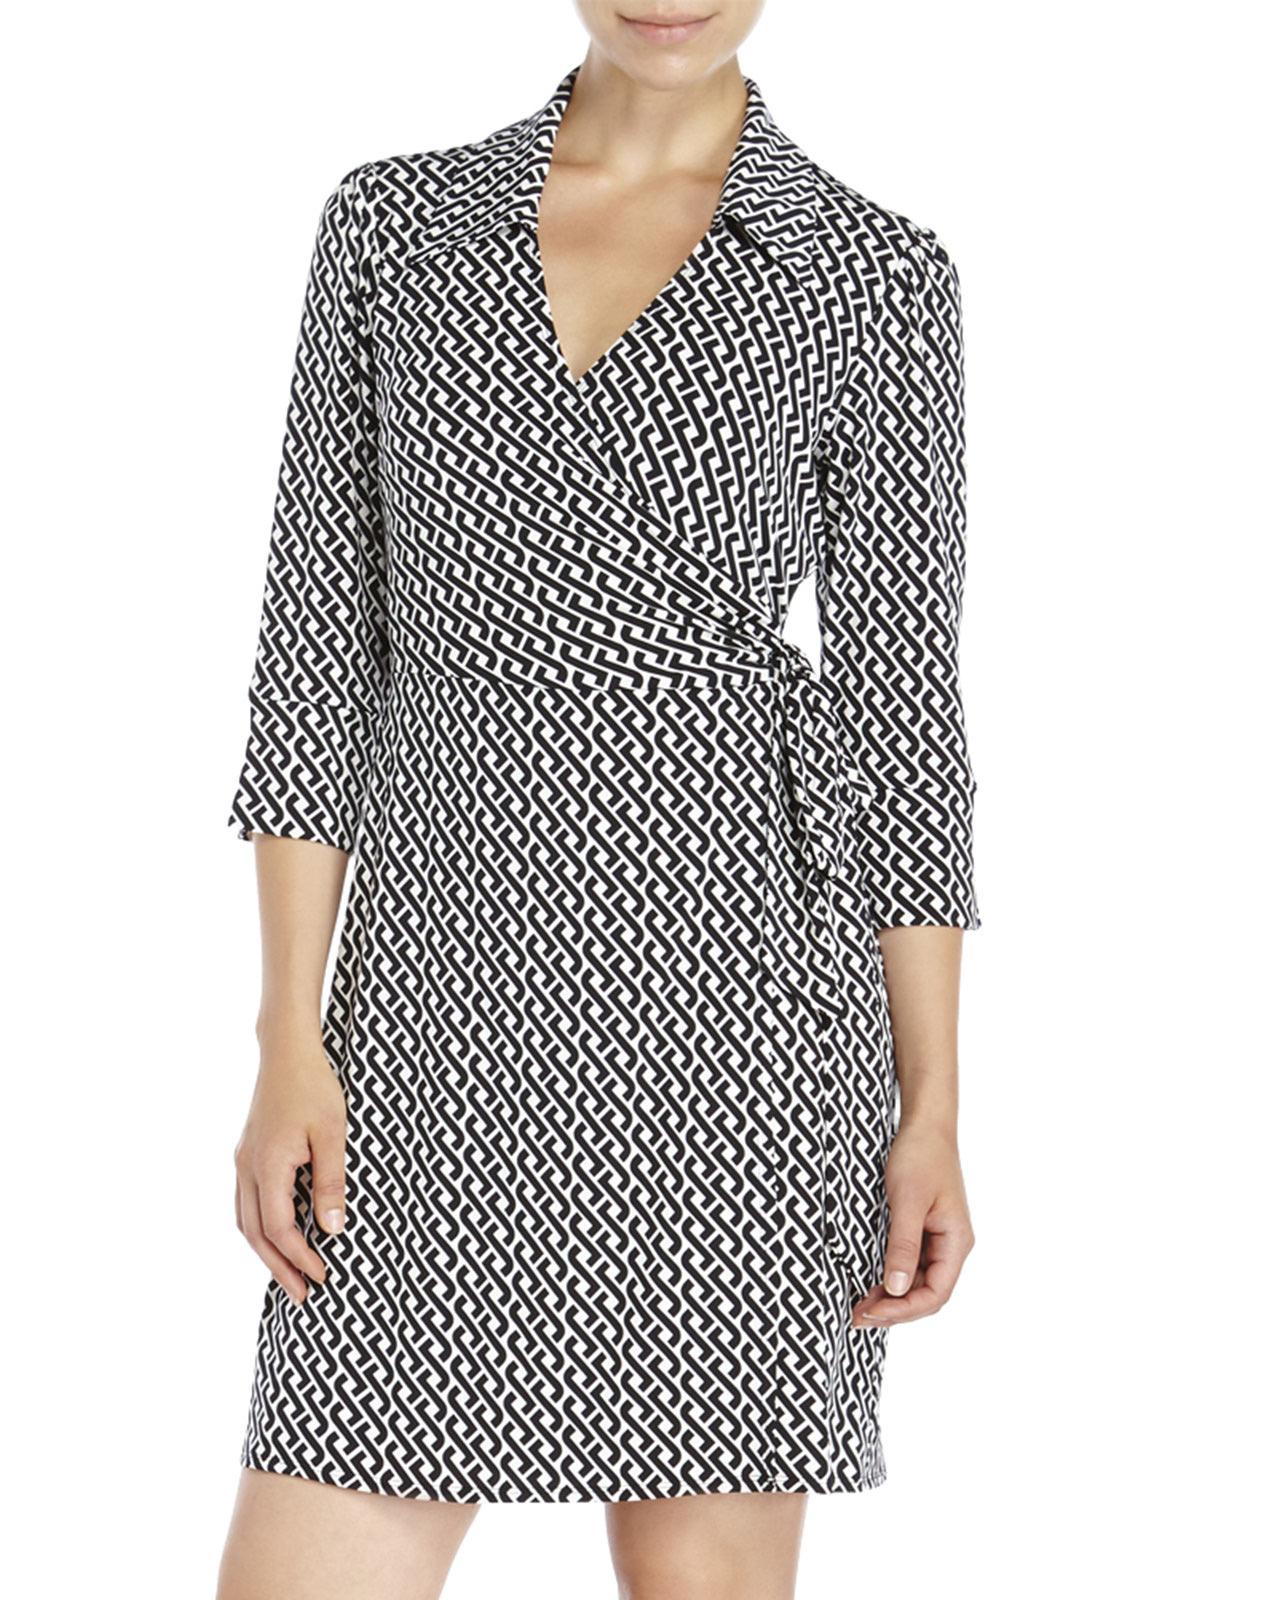 Laundry by shelli segal Link Print Jersey Wrap Dress in Black Lyst